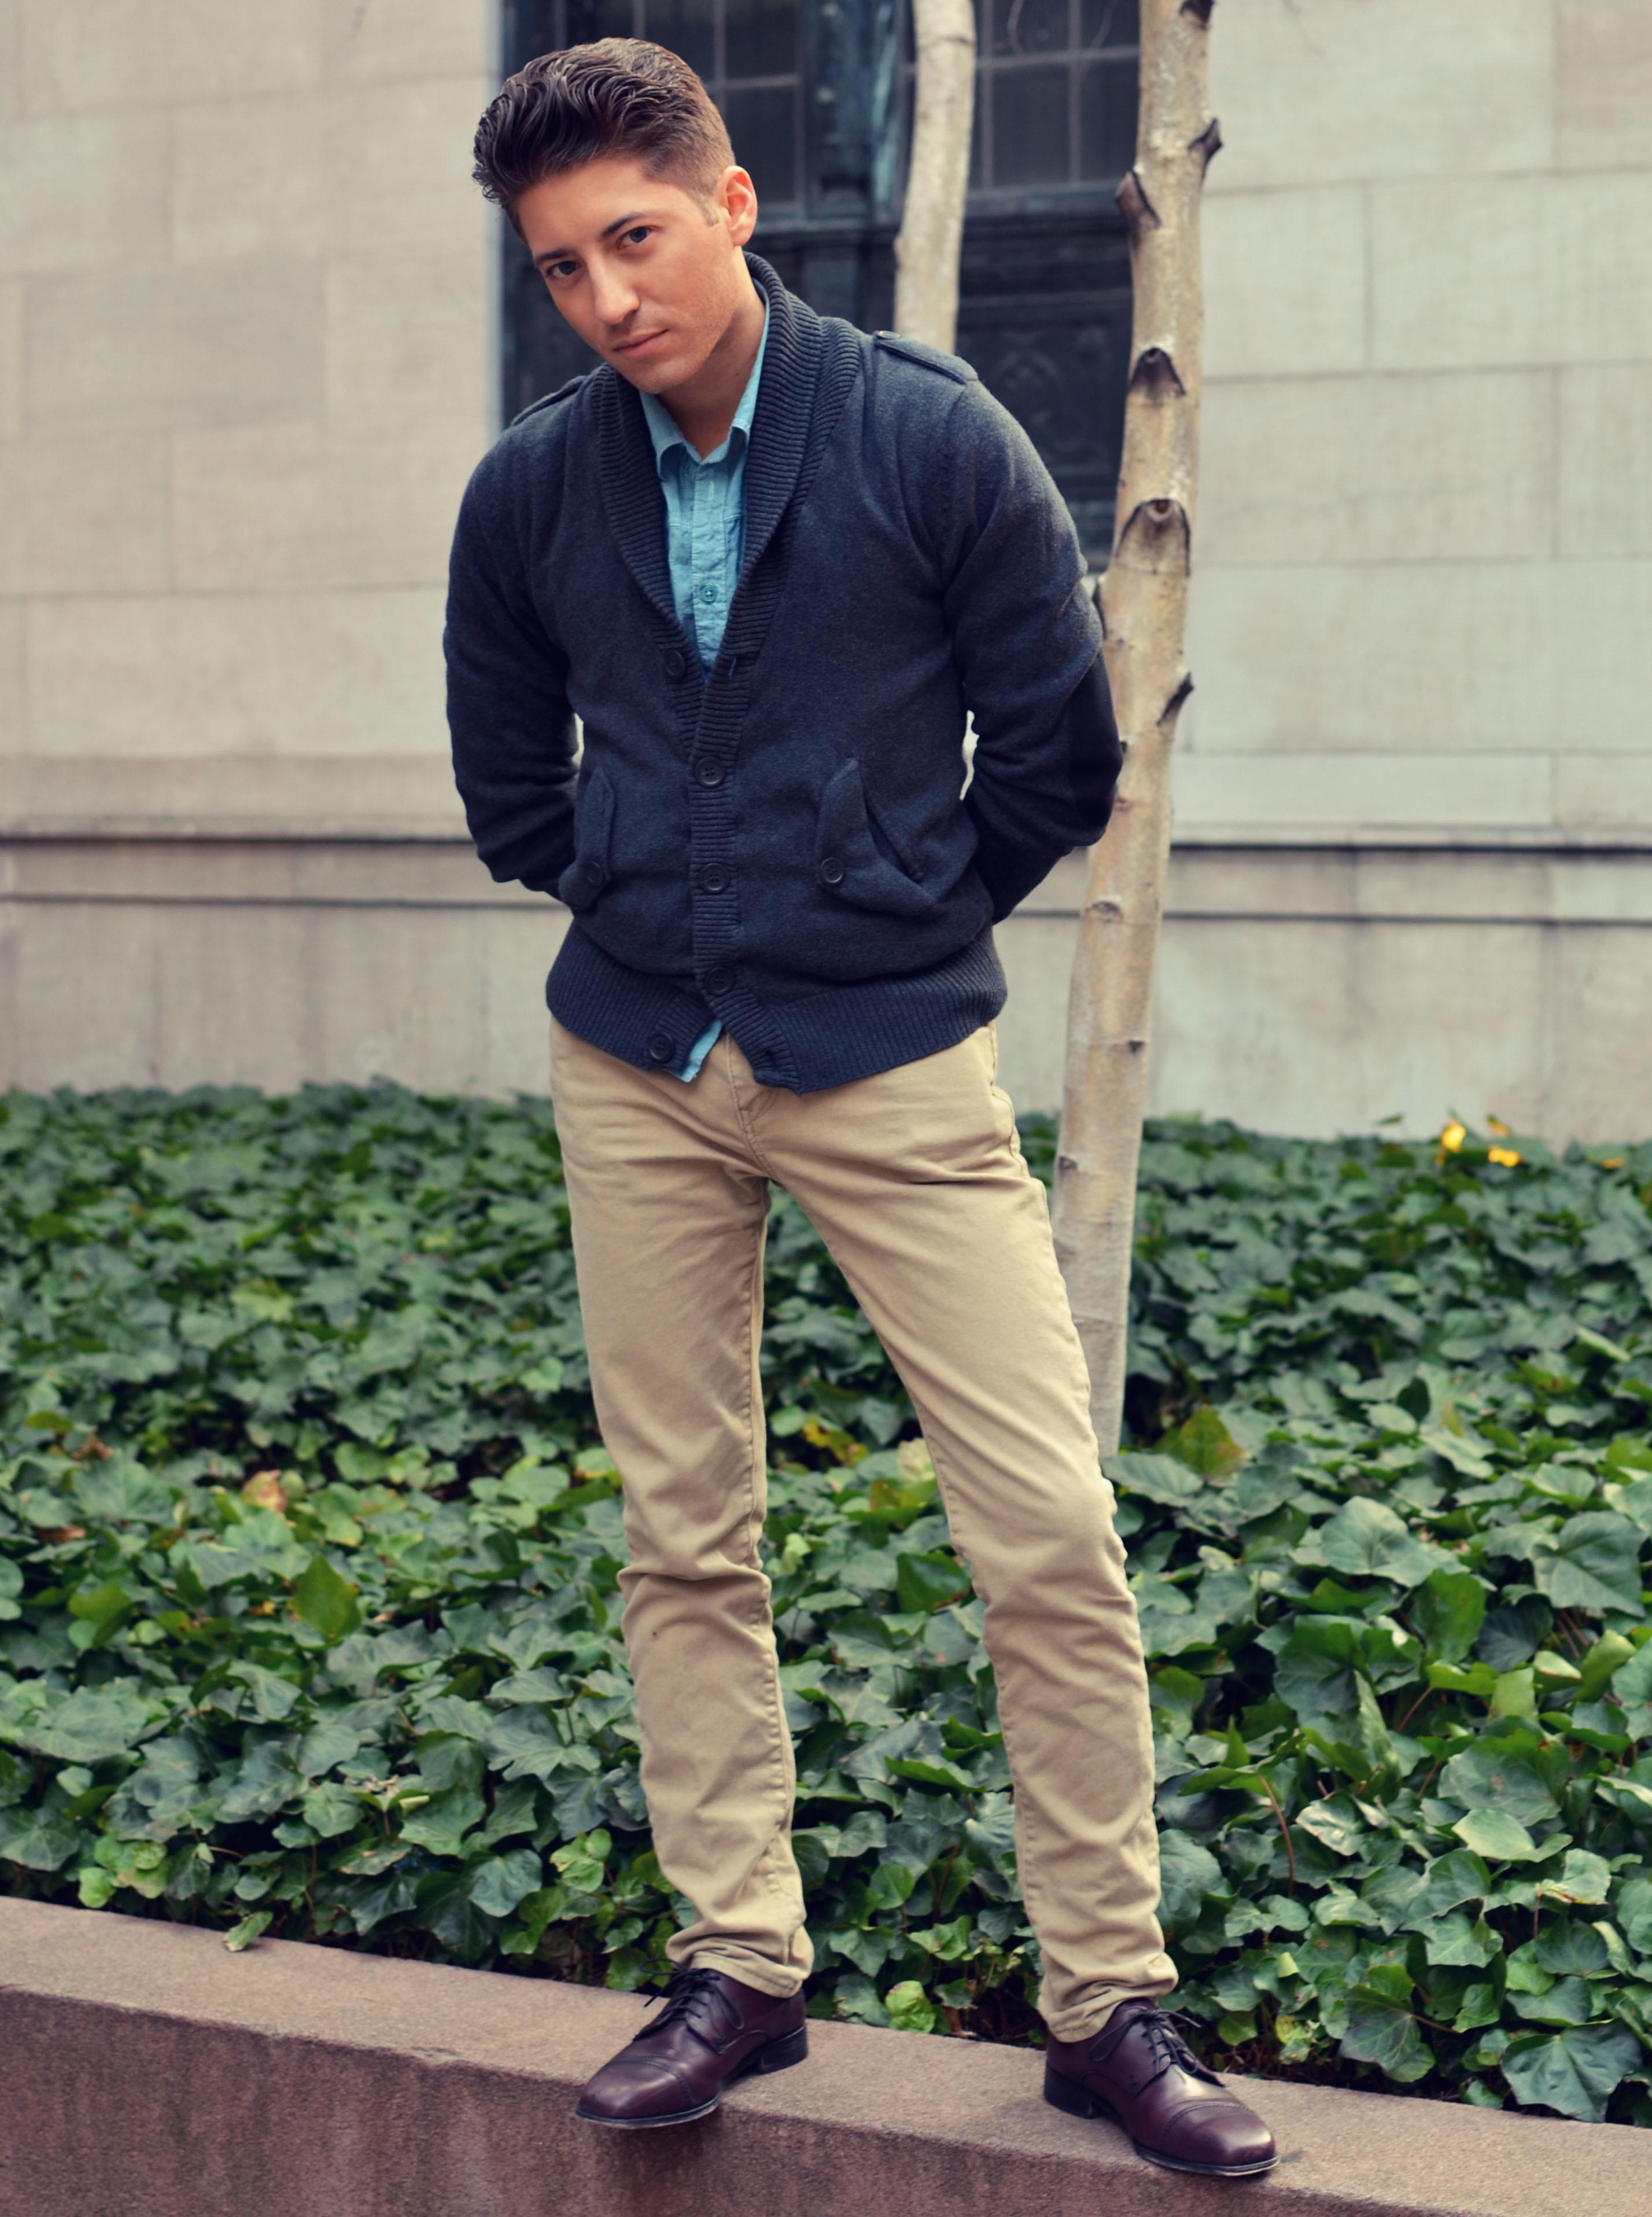 Navy Shirt Khaki Pants Brown Shoes - Style Guru Fashion Glitz Glamour Style unplugged